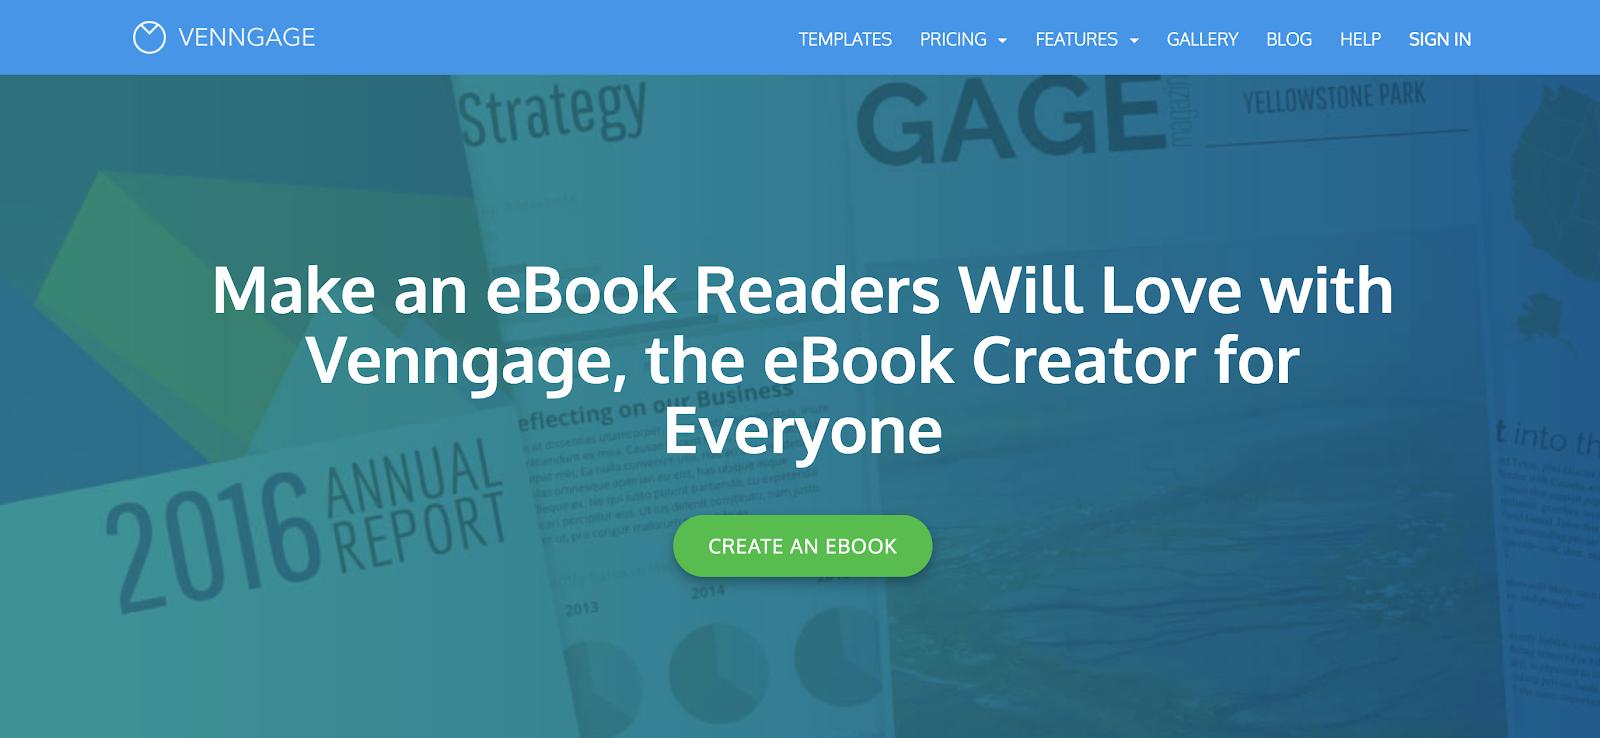 Venngage Homepage Screenshot (eBook Designer Tool)